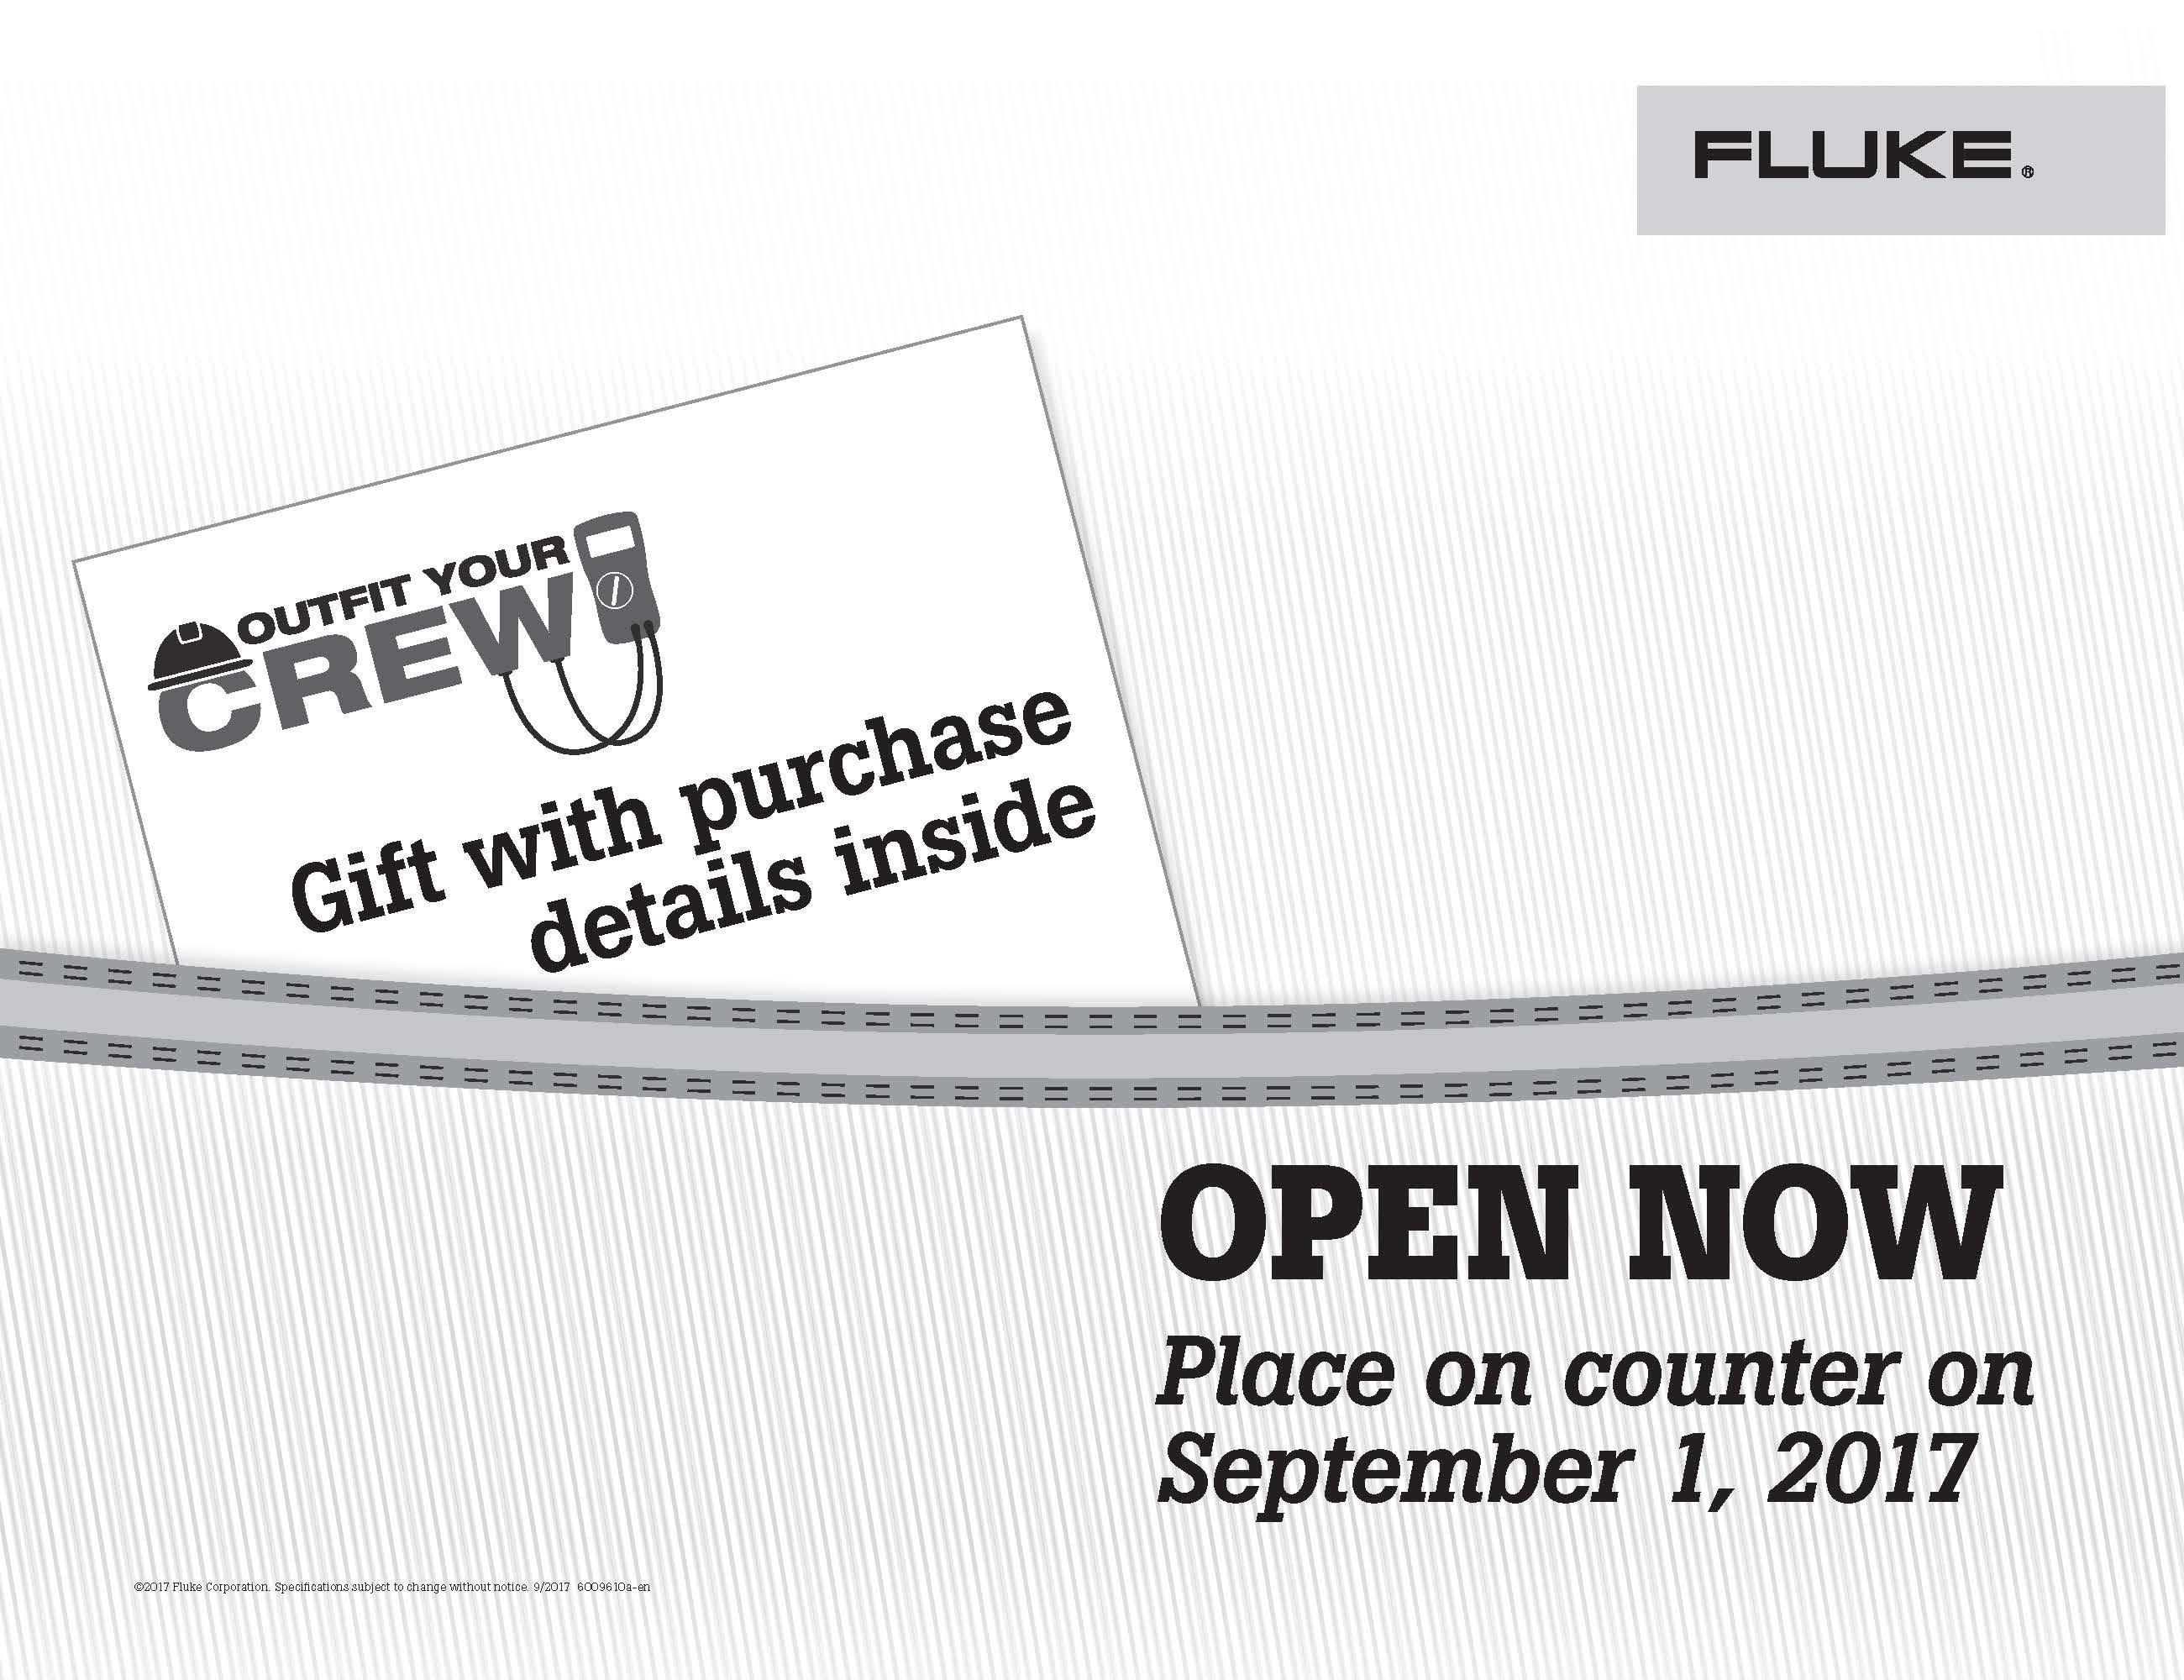 Fluke T3 National Promo, Outfit Your Crew, Kit Envelope